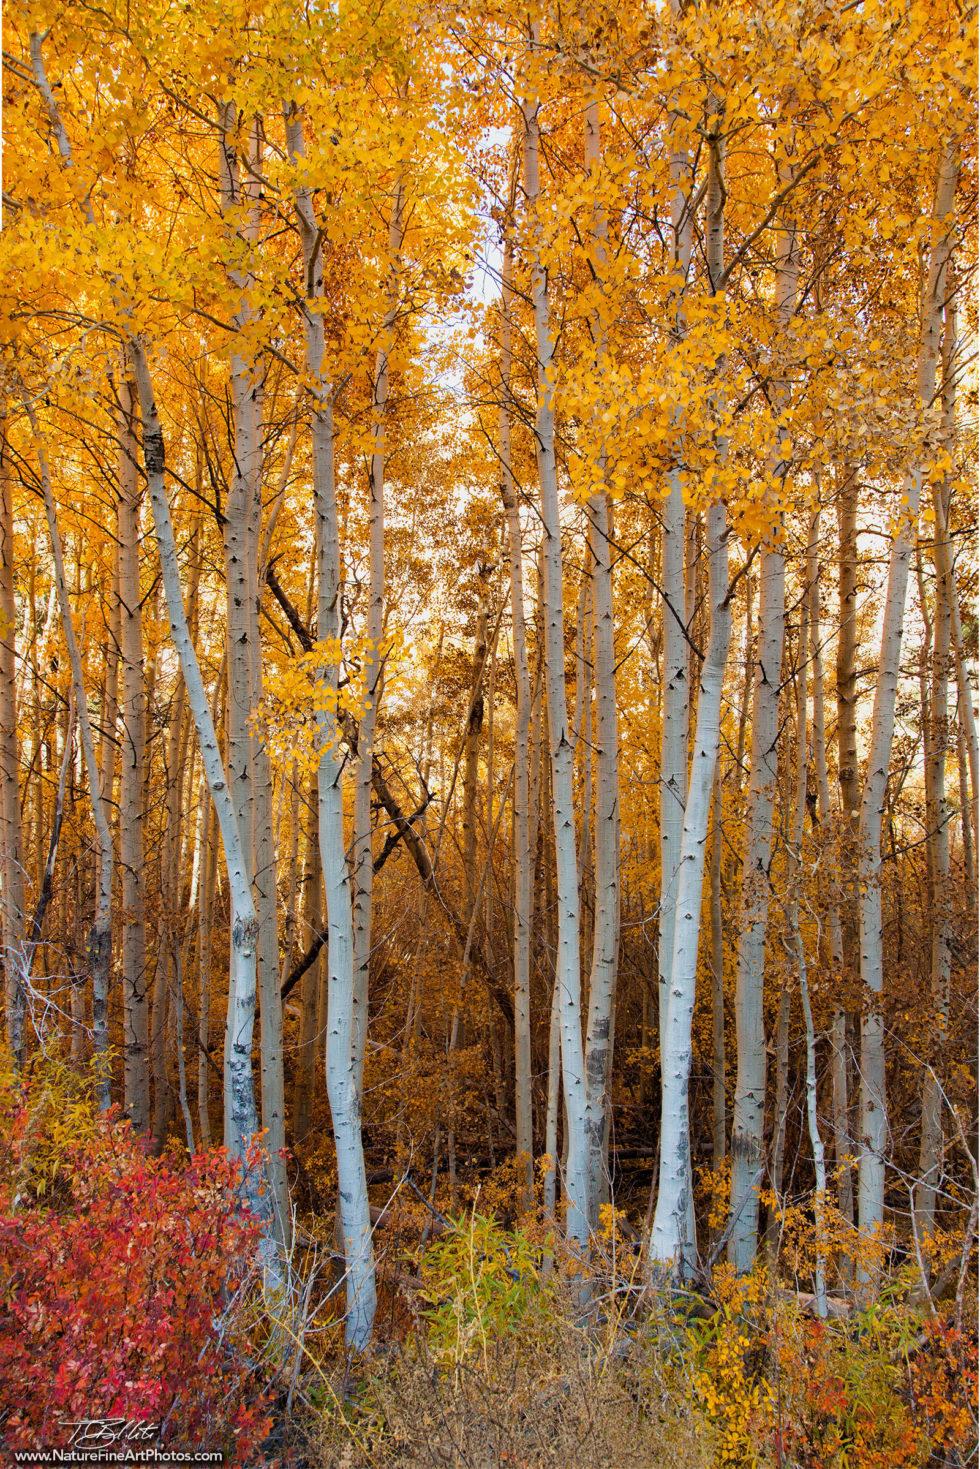 Nature Photo of Aspen Foliage